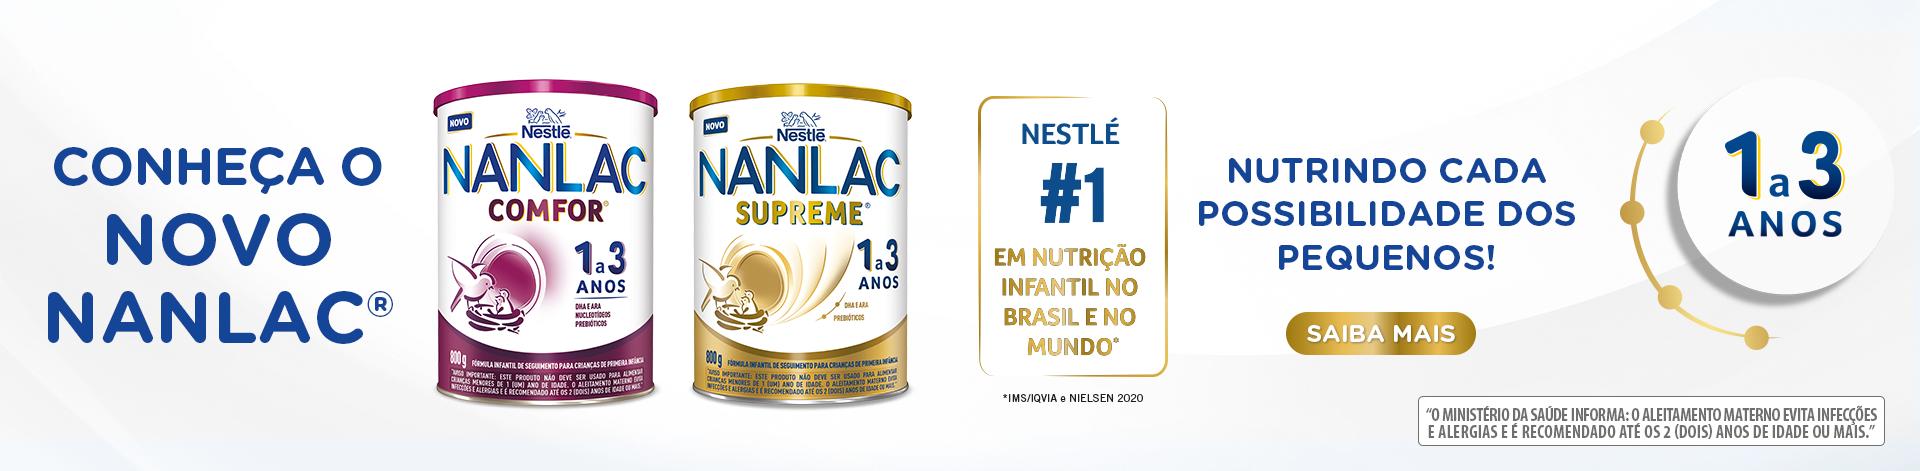 Banner nanlac